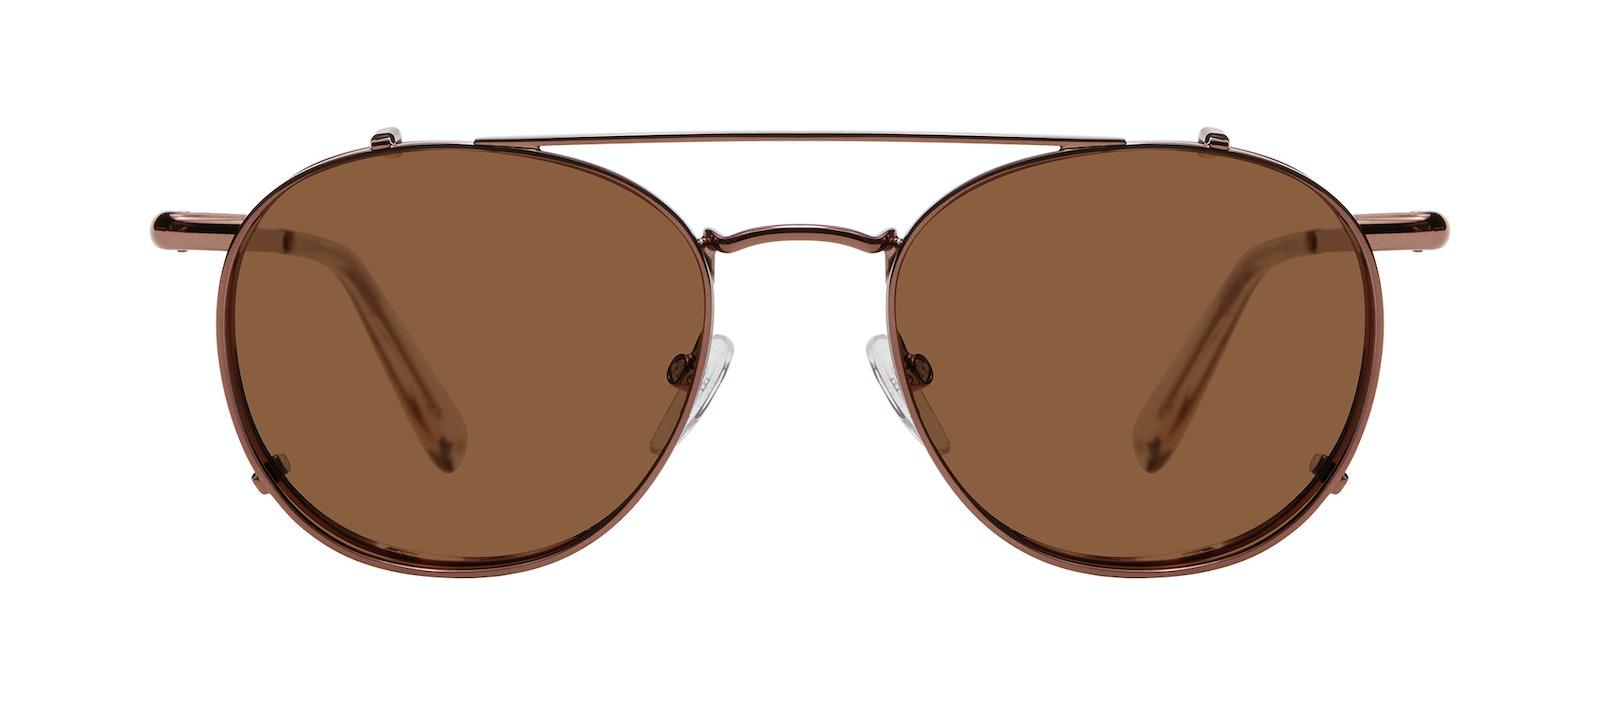 Affordable Fashion Glasses Accessory Men Women Divine Clip L Copper Side